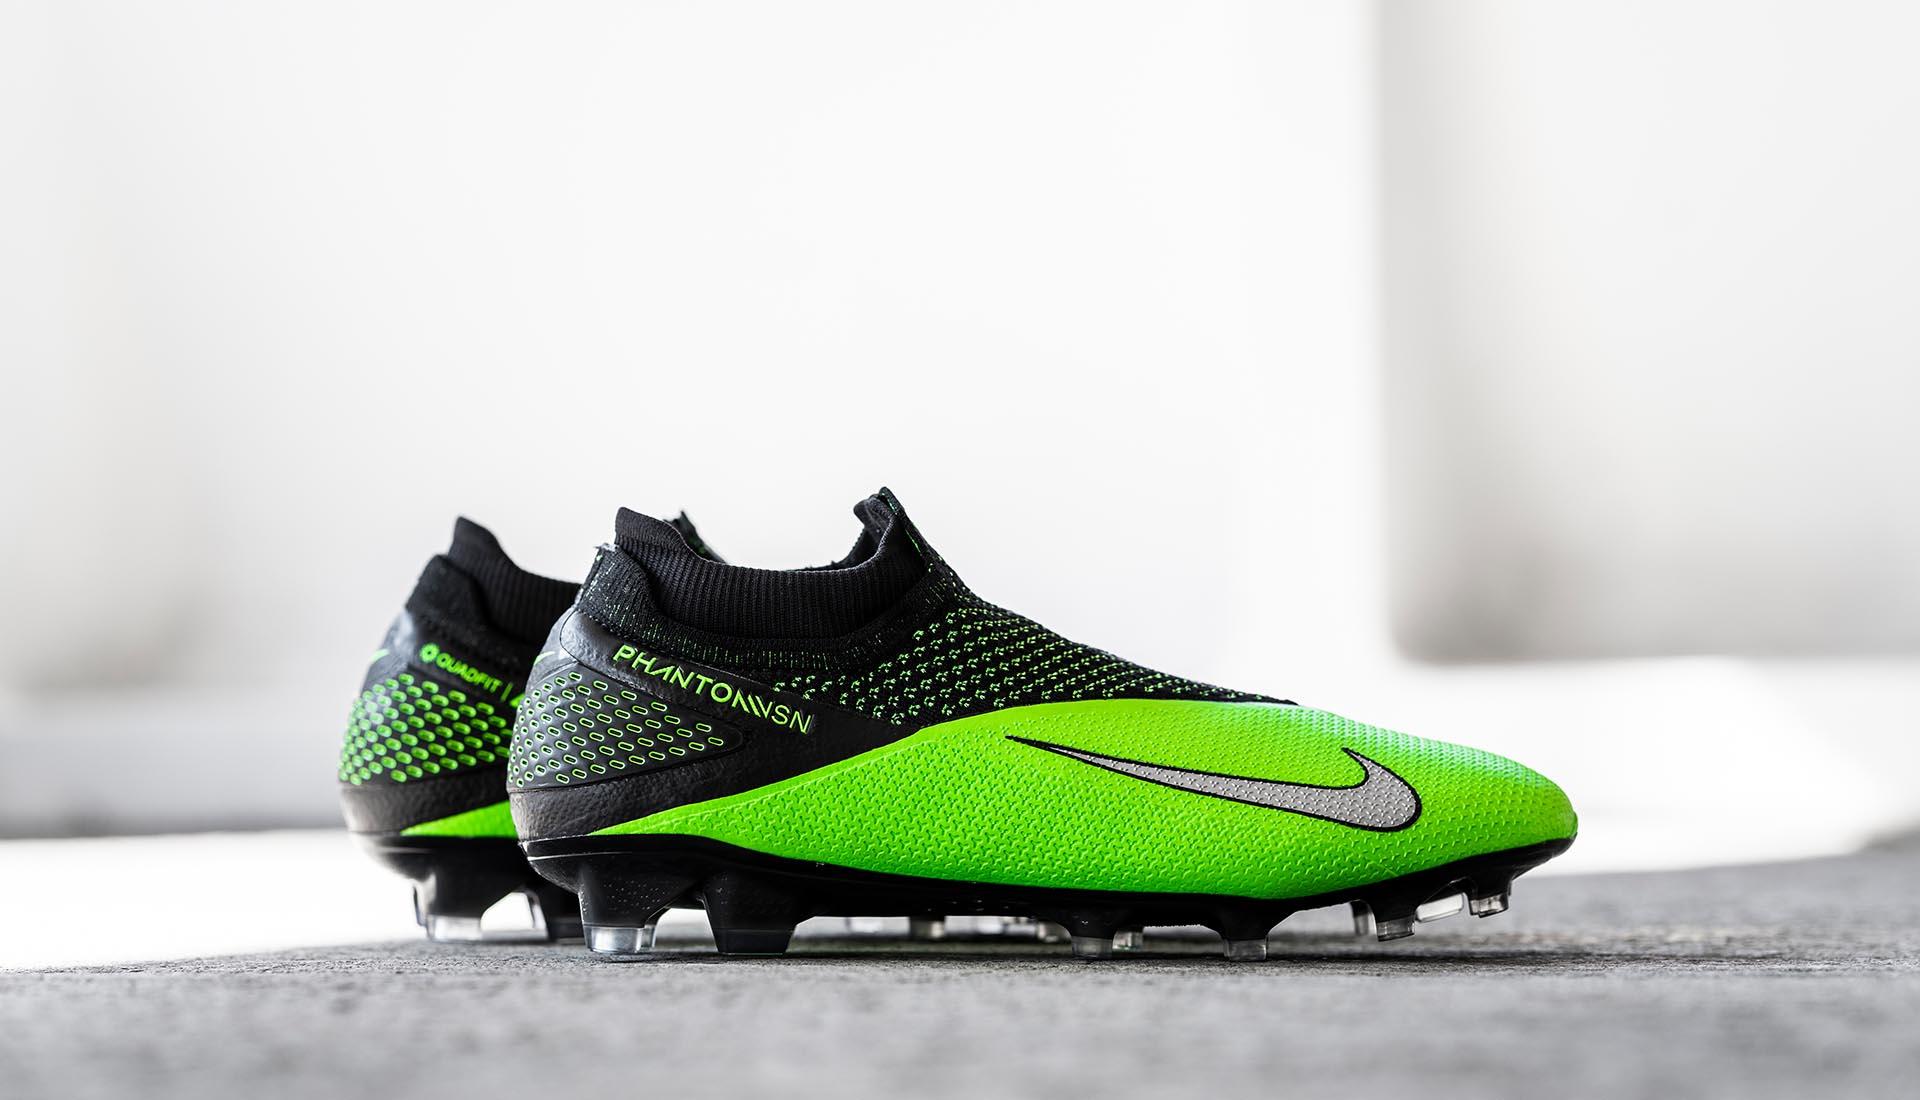 Bo suu tap giay da bong Nike Future lab 2 (II) nam 2020 (9)